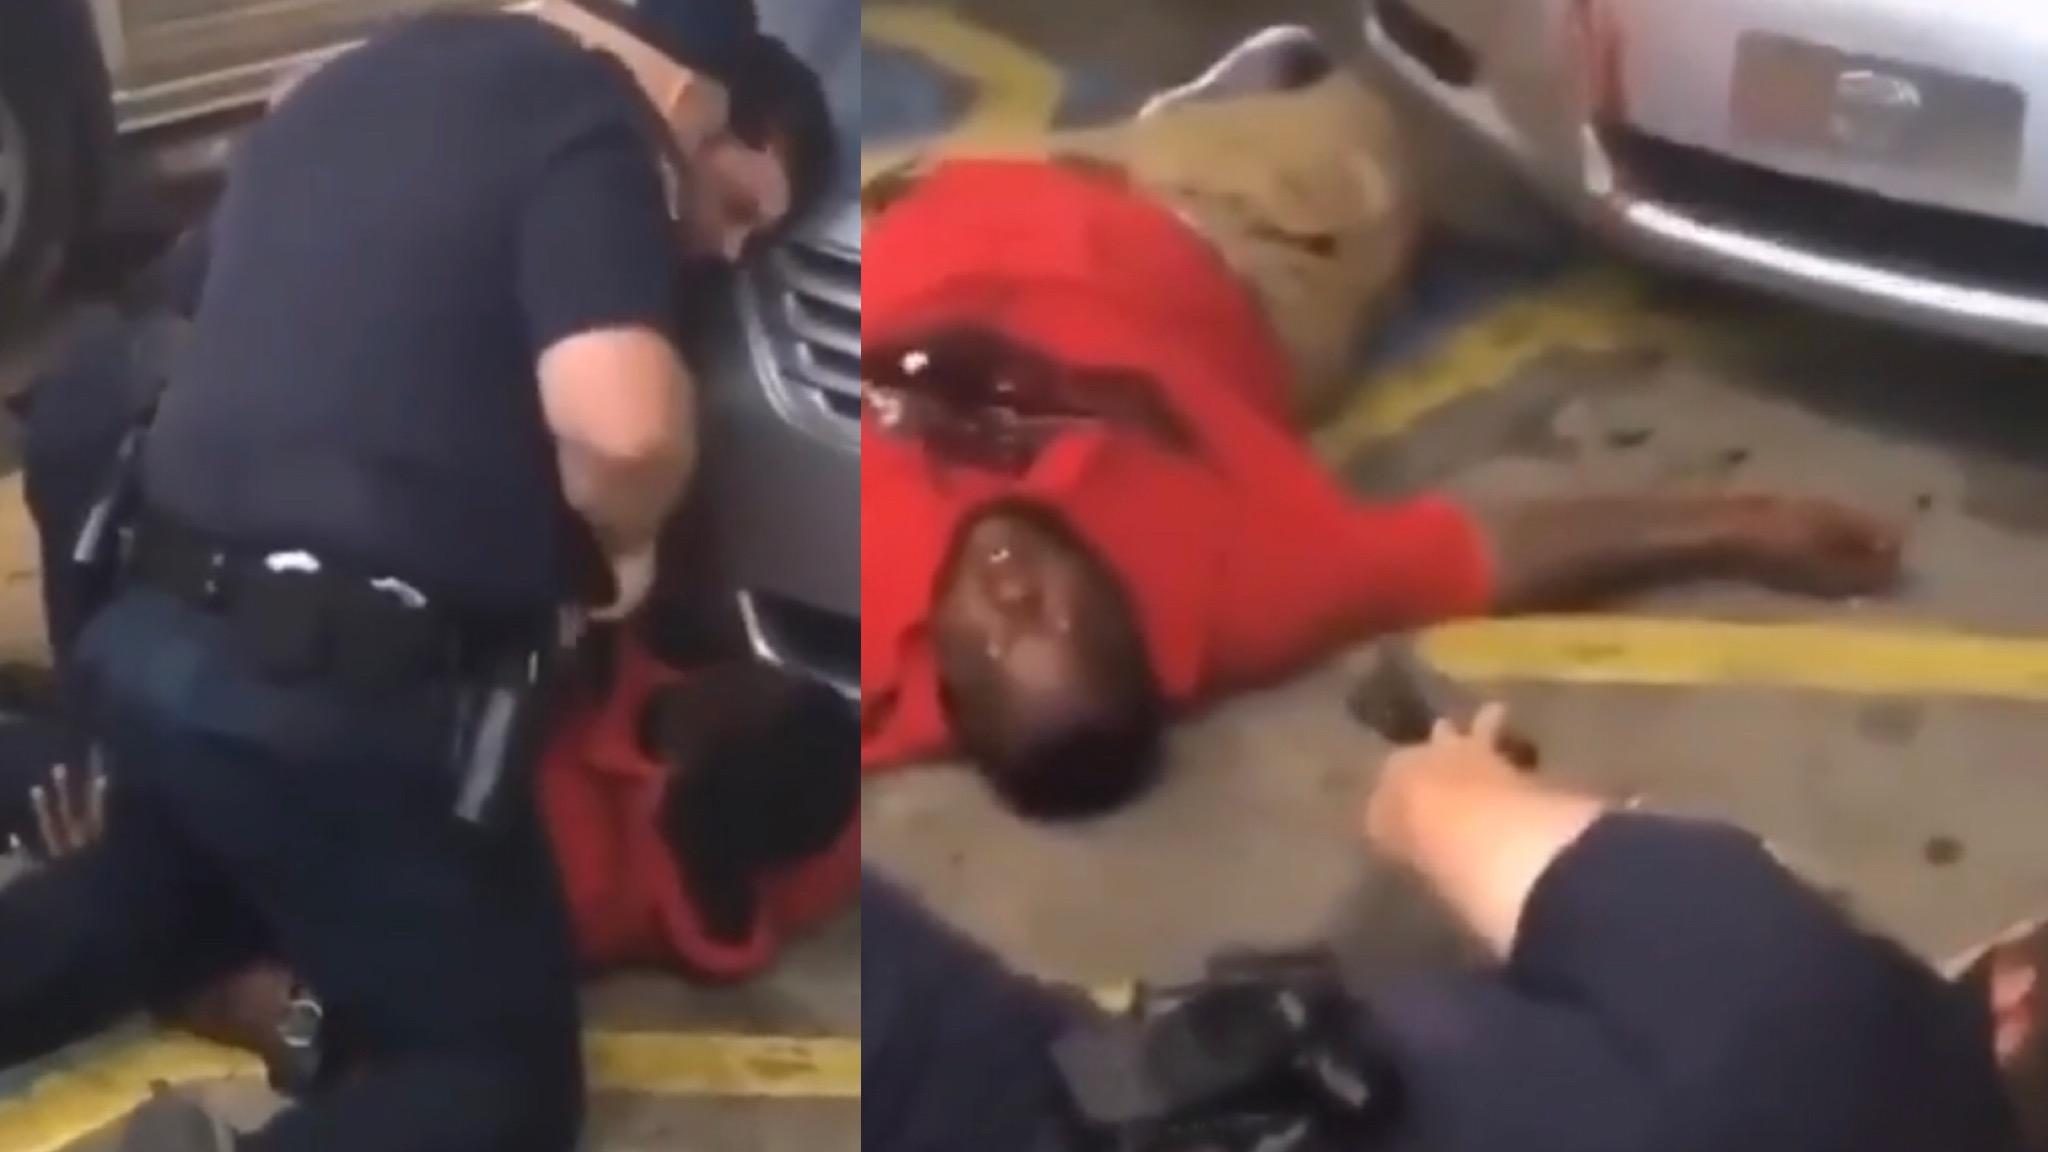 NSFW (18+) Baton Rouge Police Kill Black Man For No Reason